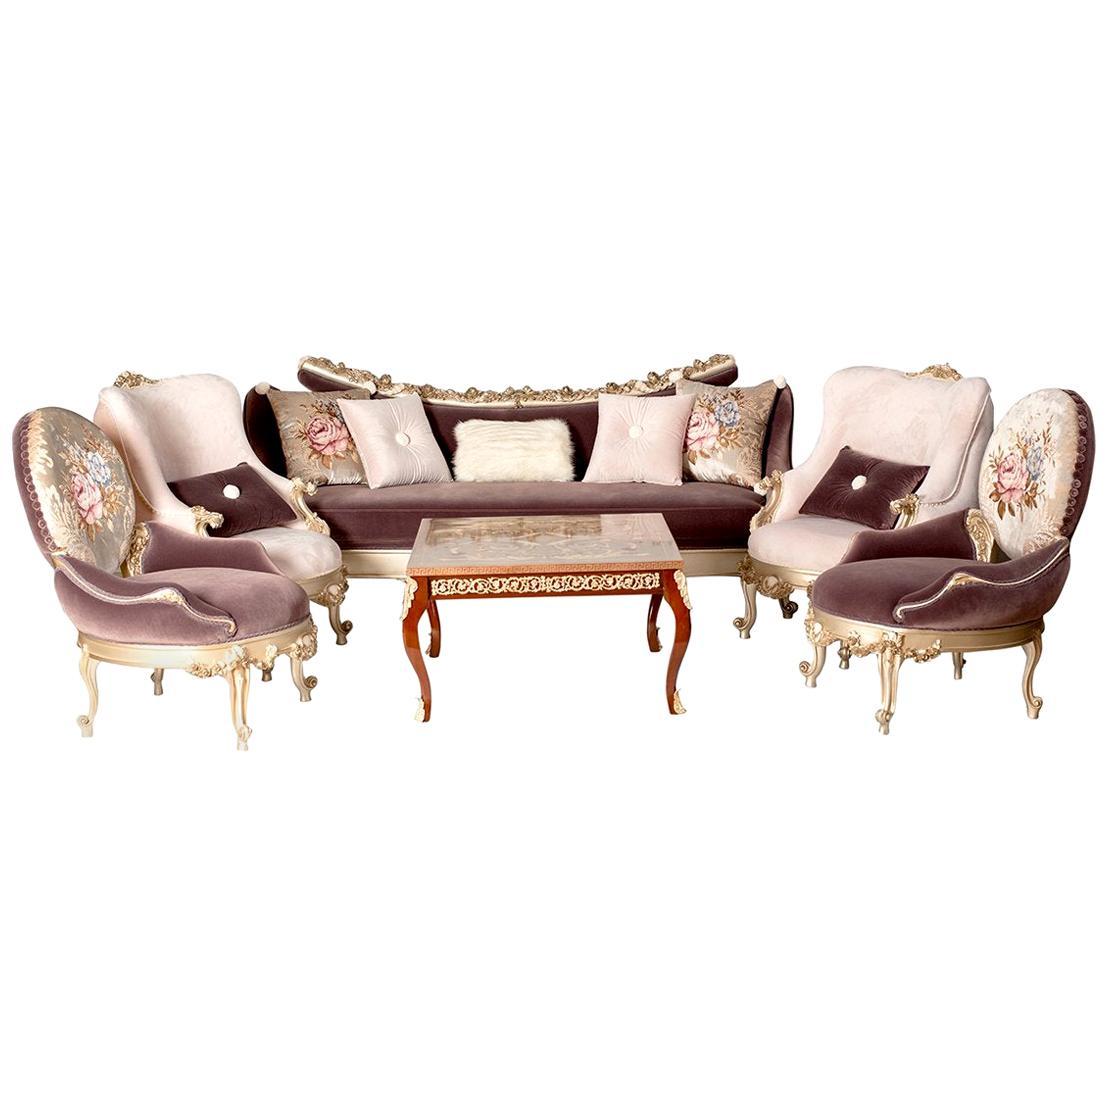 Classical Precious Carved Living Room '6 Pieces', 20th Century